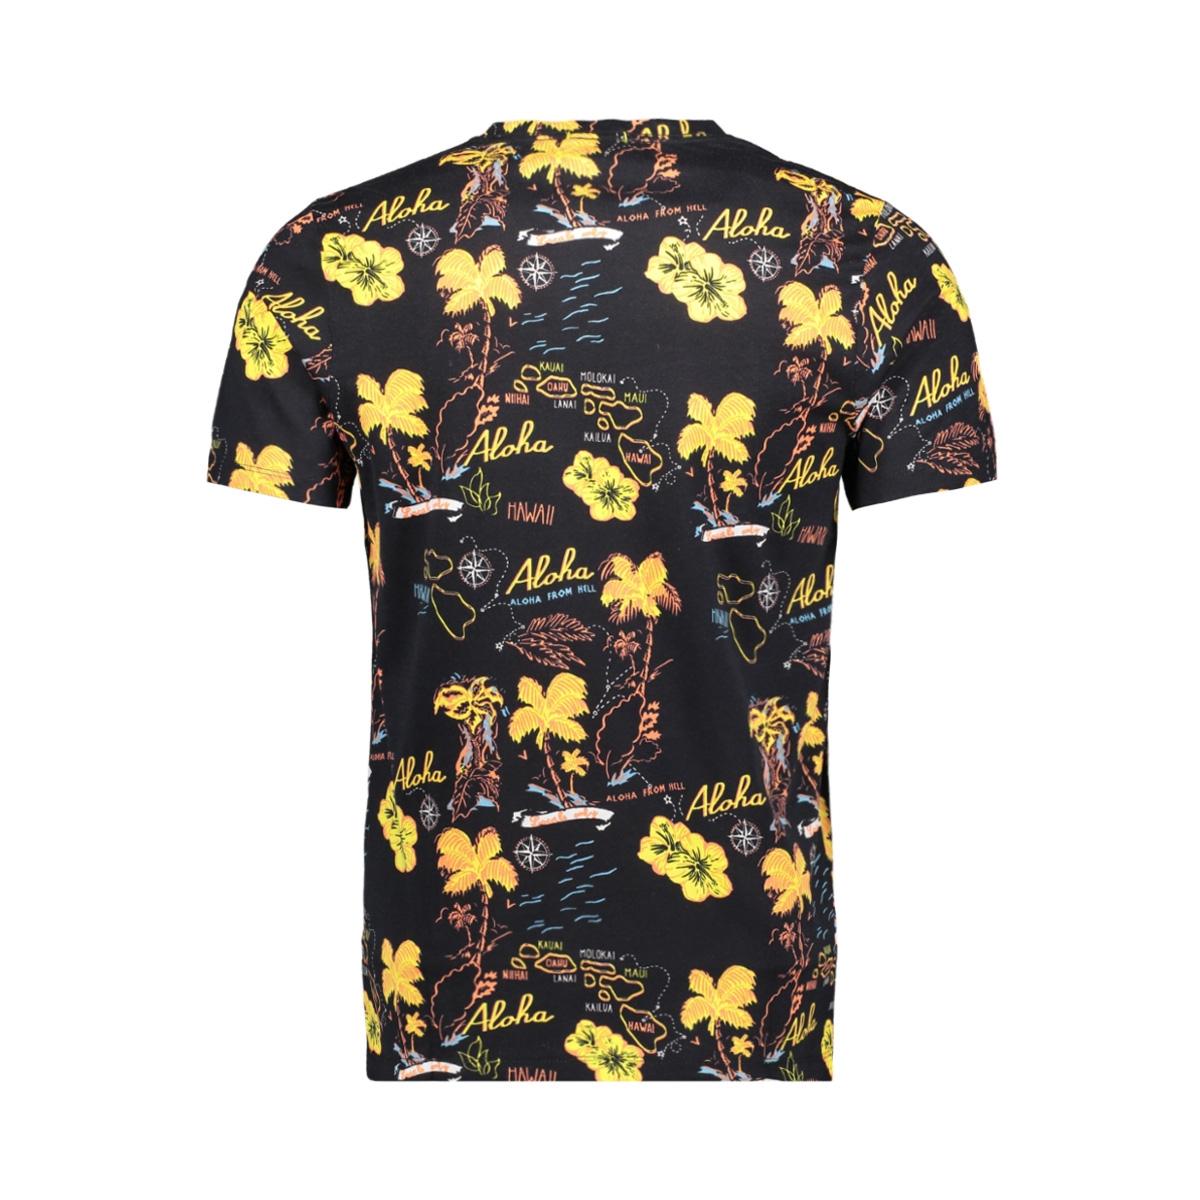 jormolokai tee ss crew neck 12152656 jack & jones t-shirt tap shoe/slim